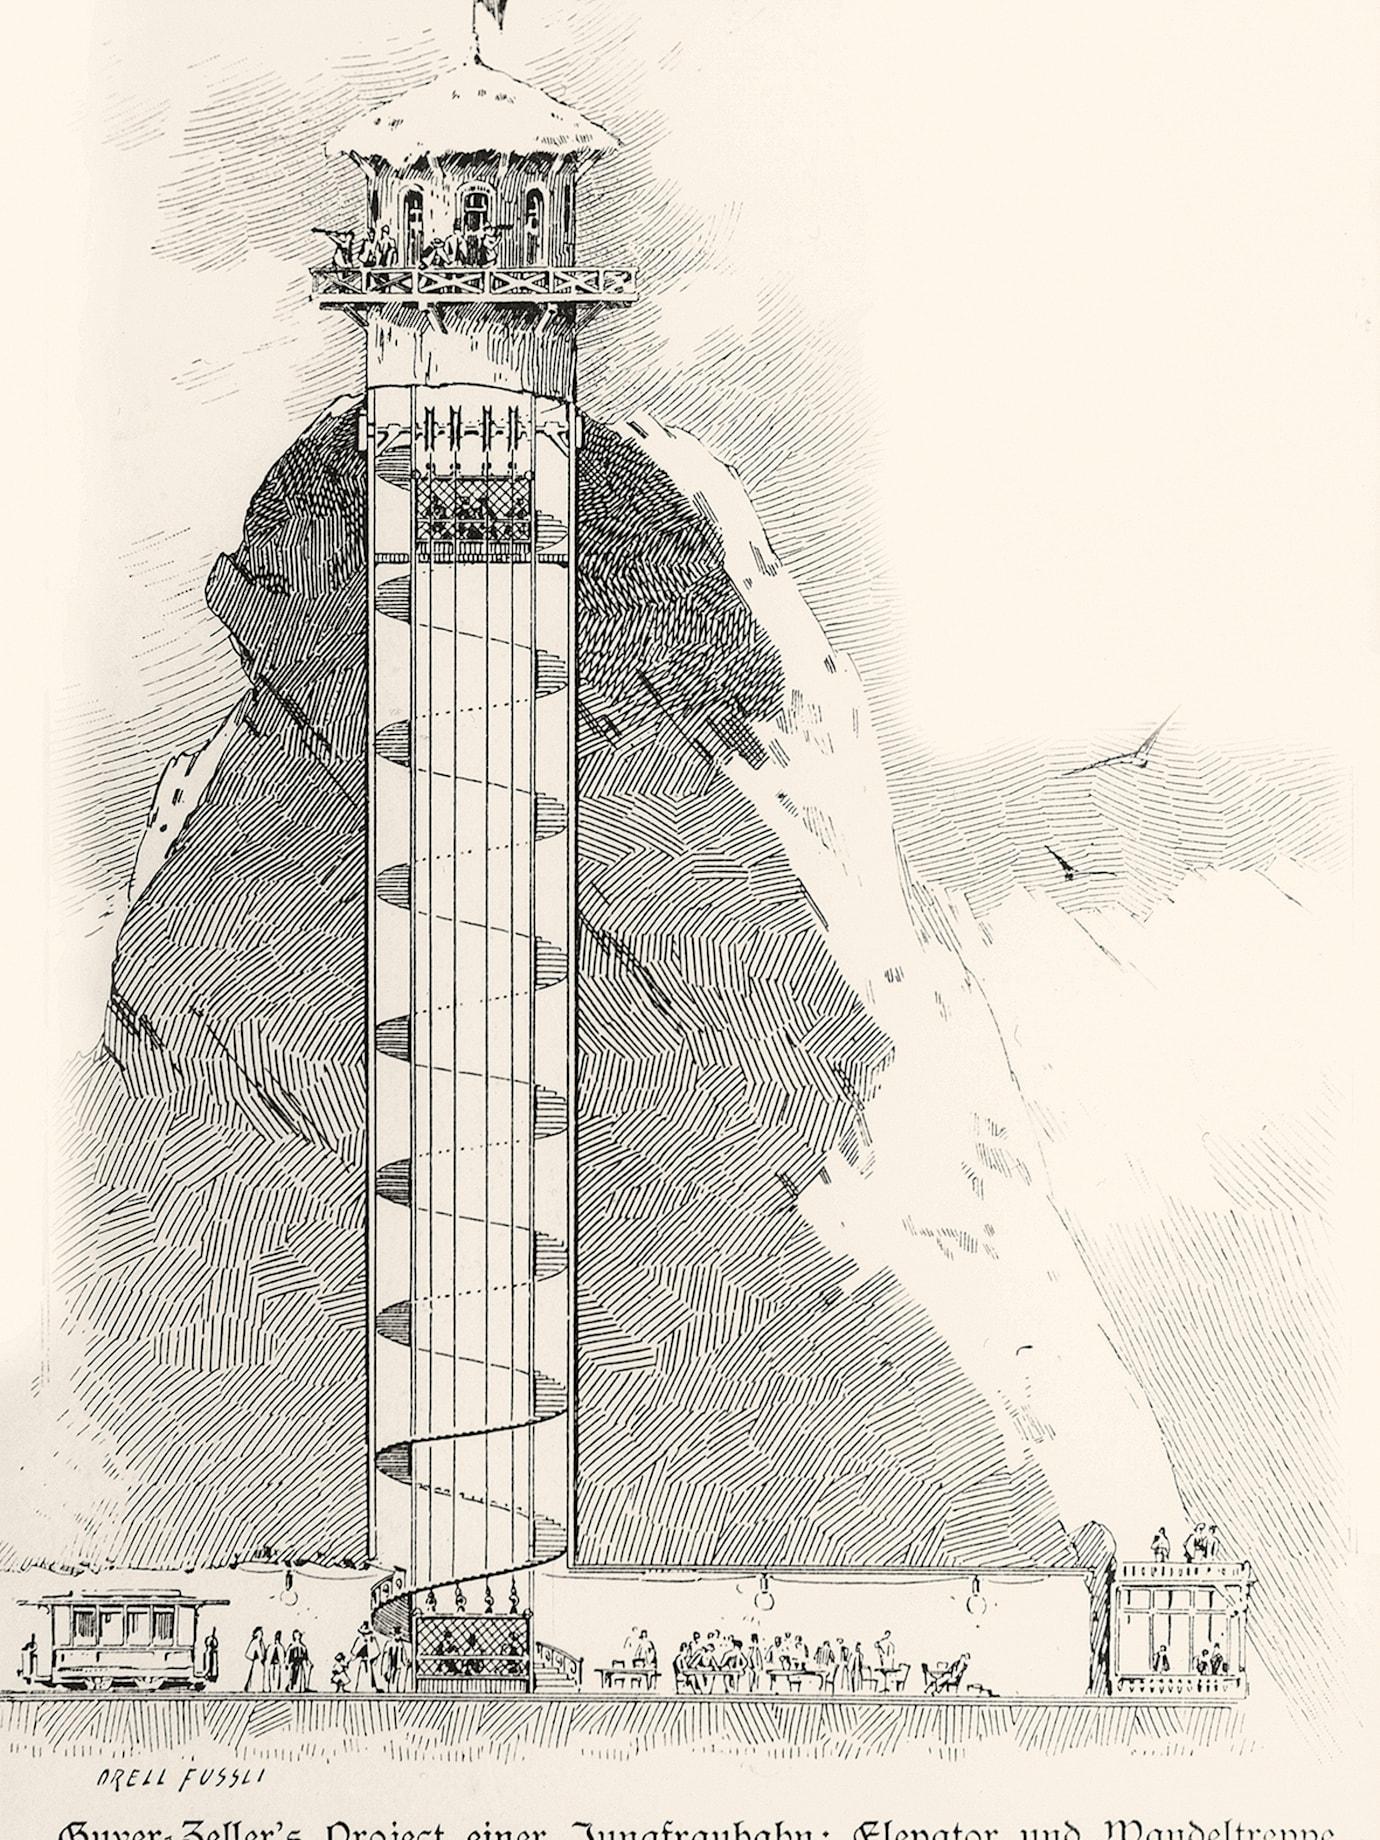 Bau der Jungfraubahn25